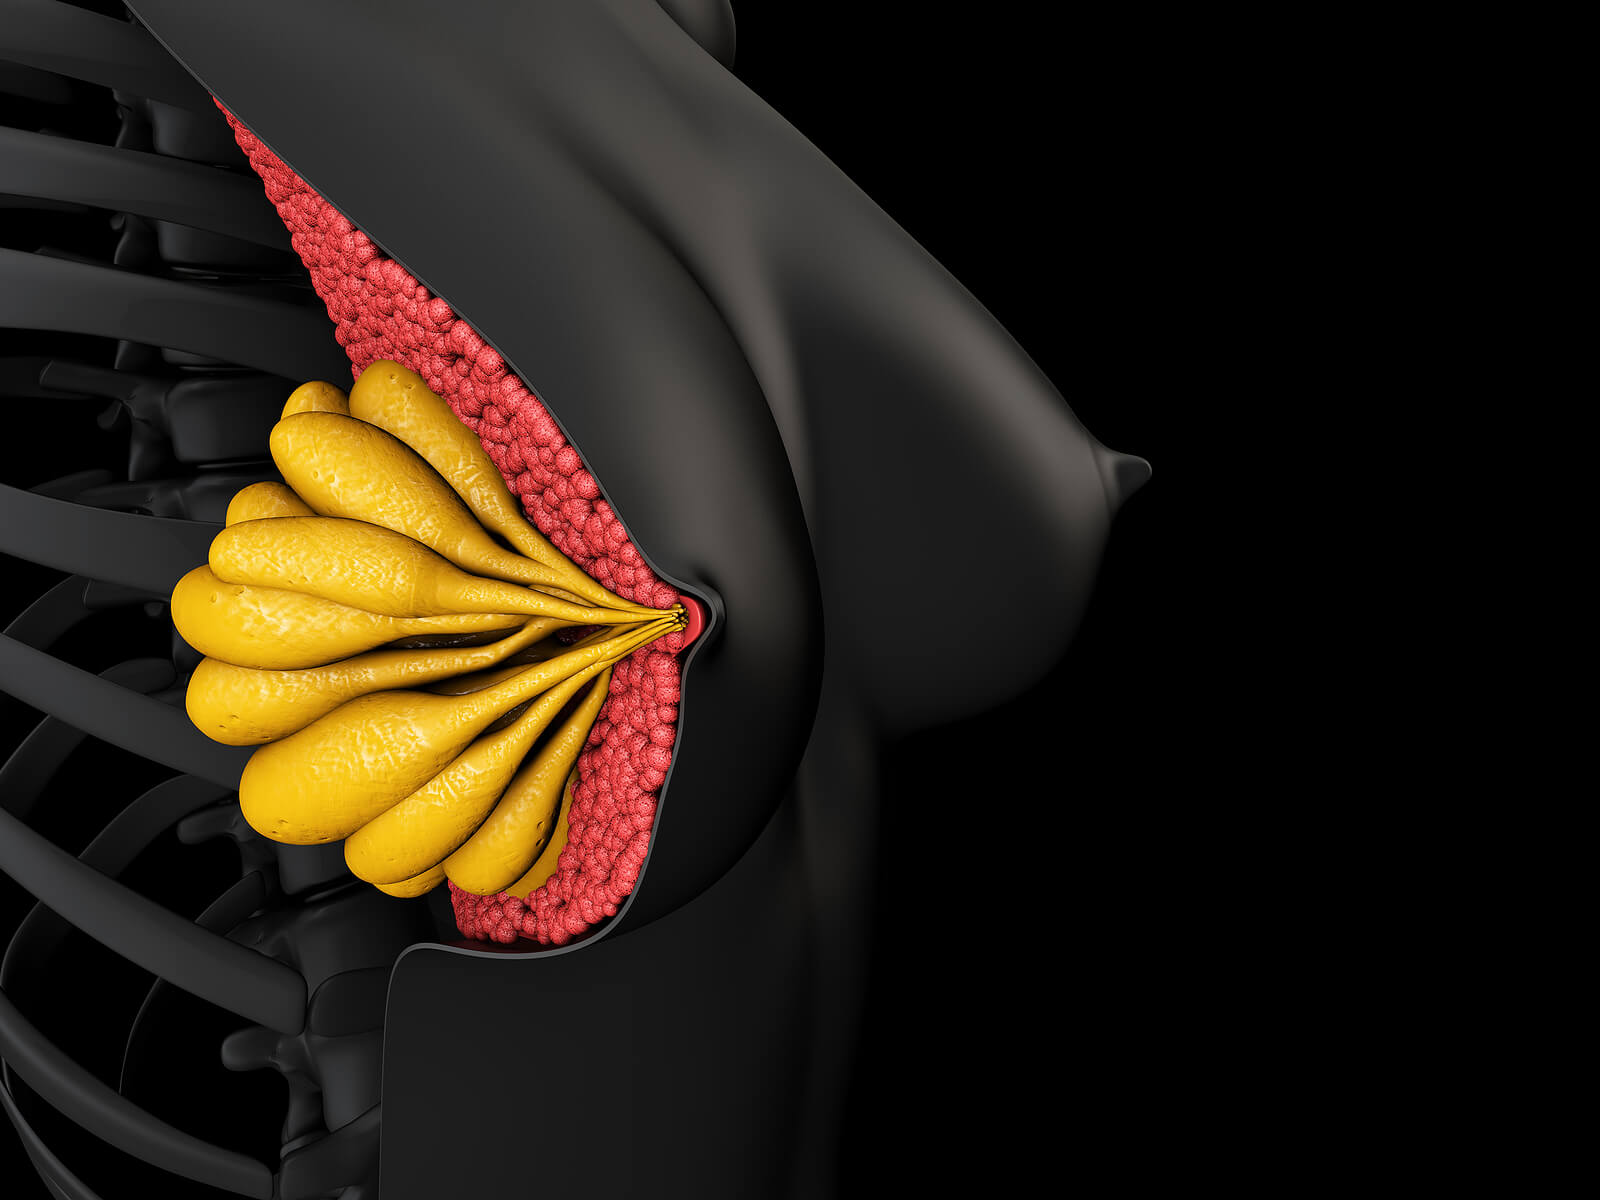 Anatomía de la mama femenina sana.